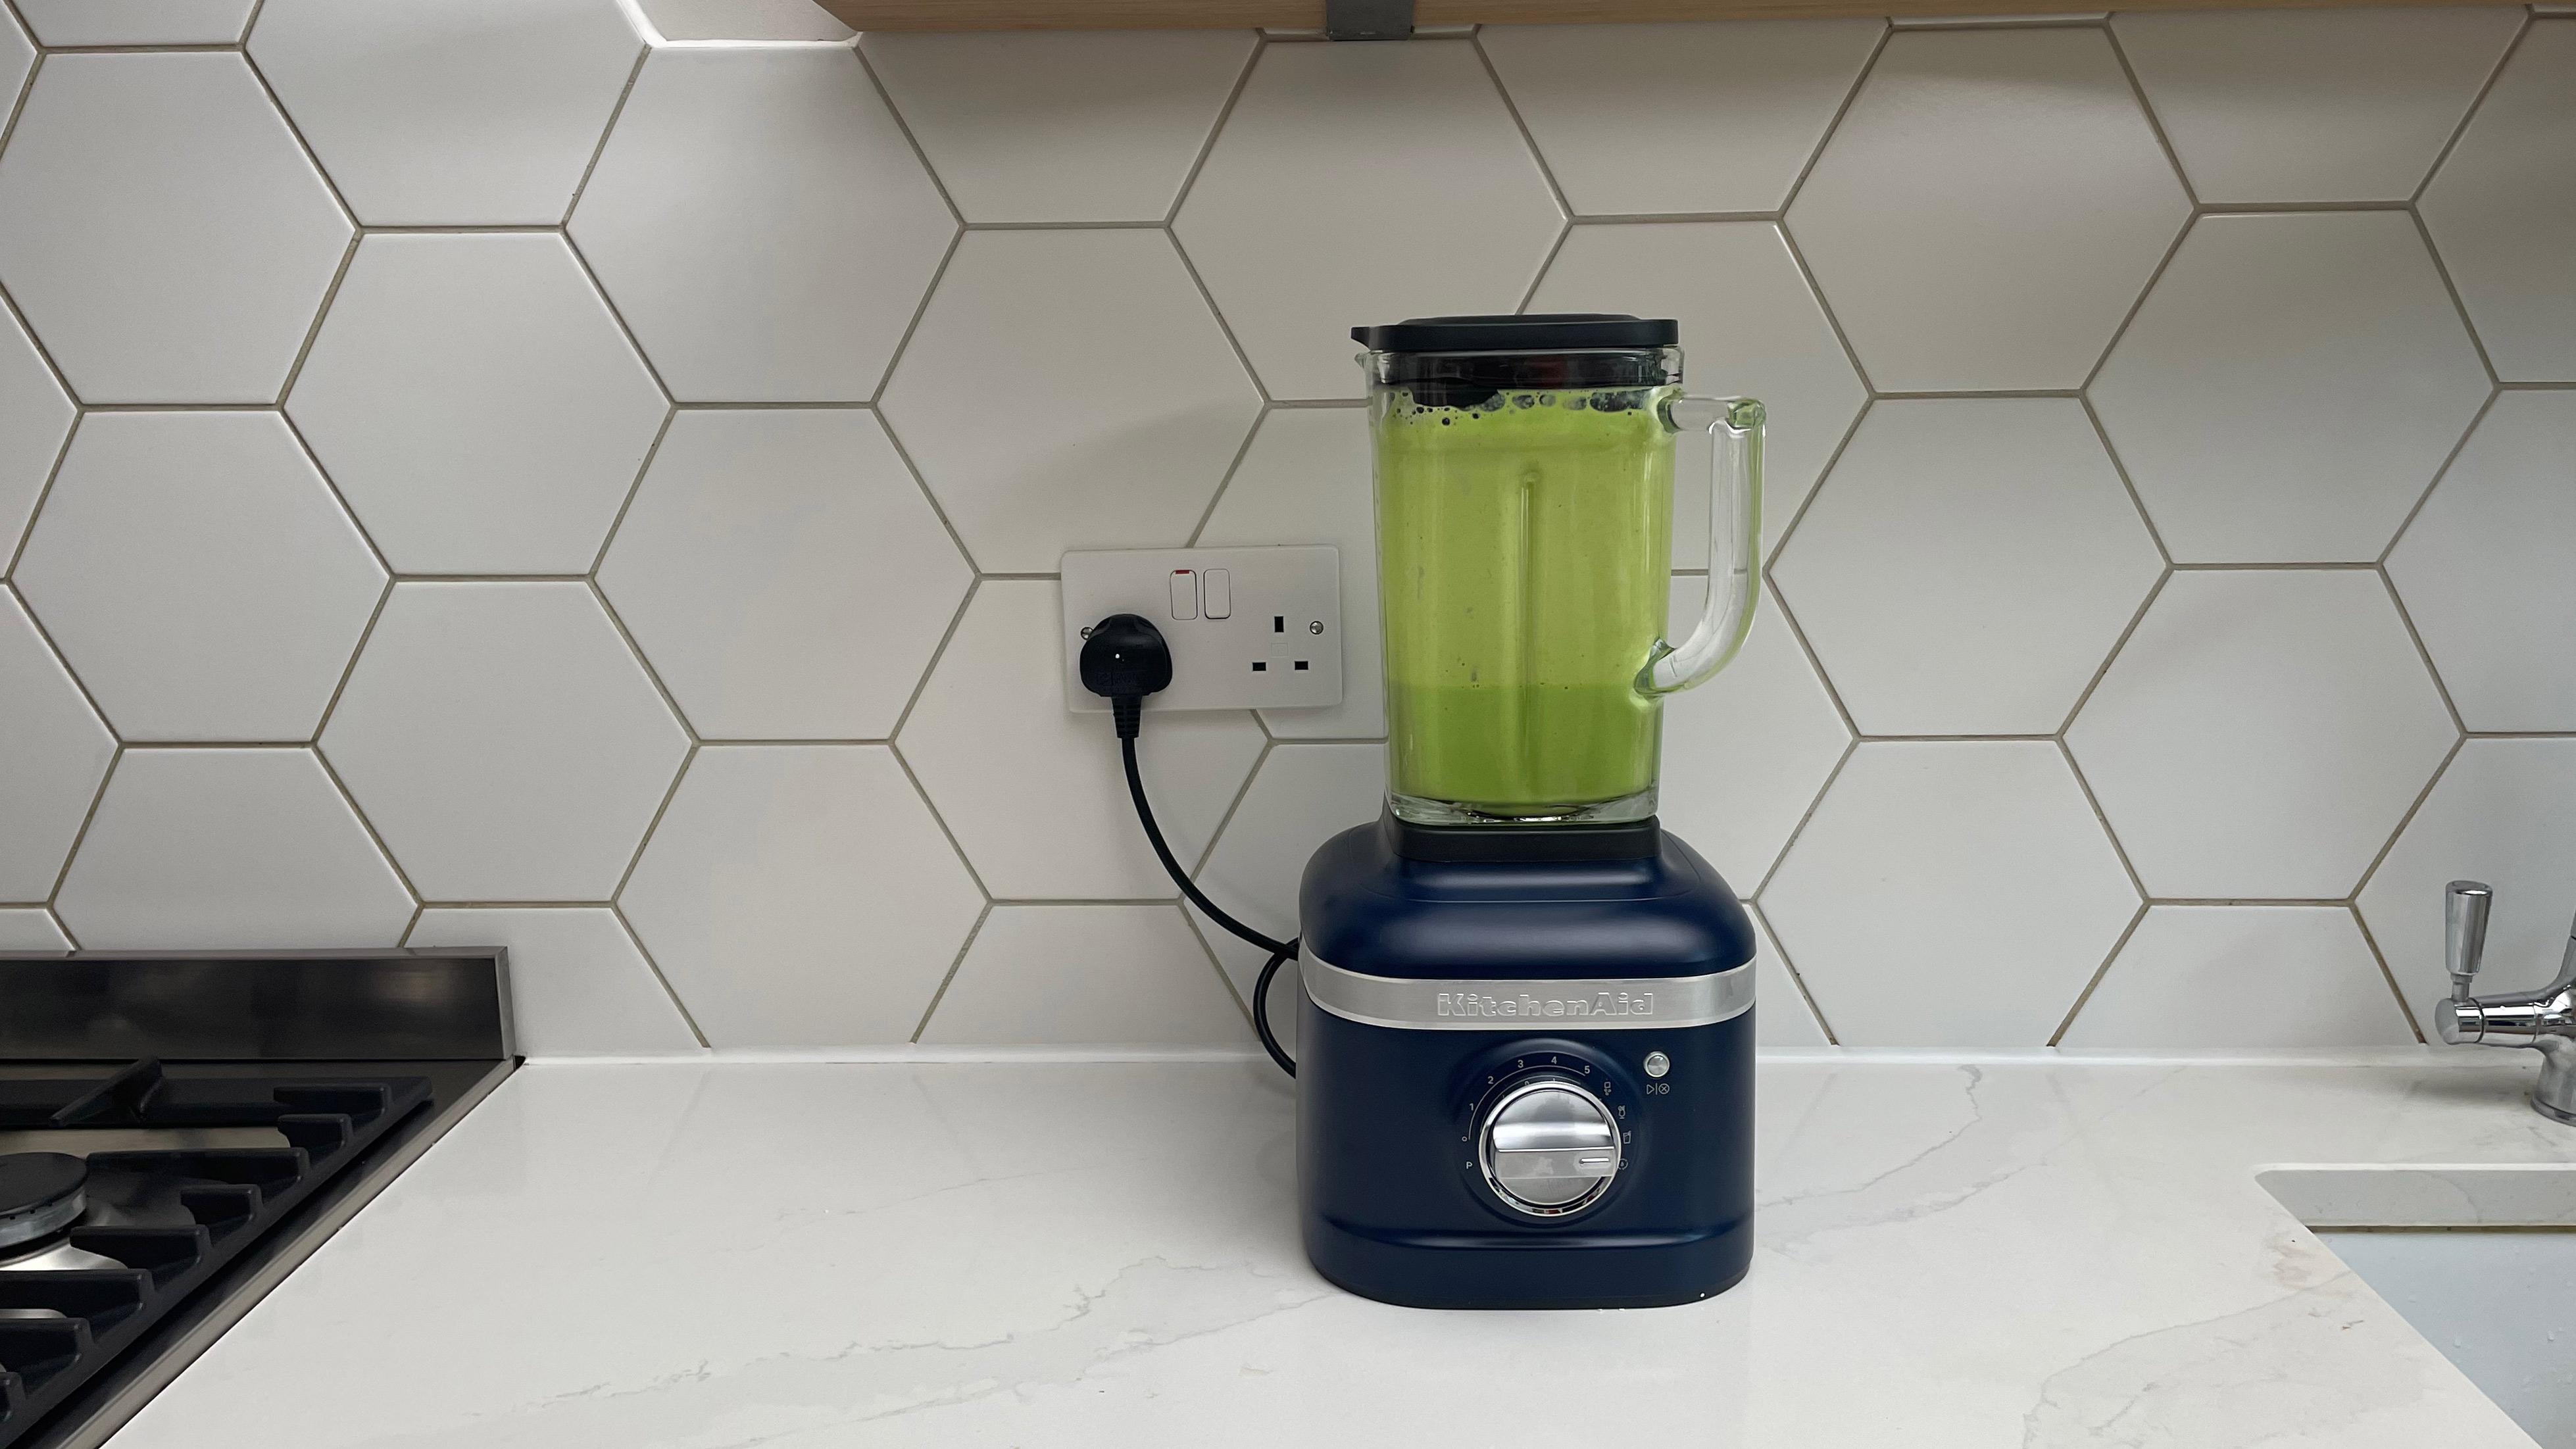 KitchenAid Artisan K400 Blender